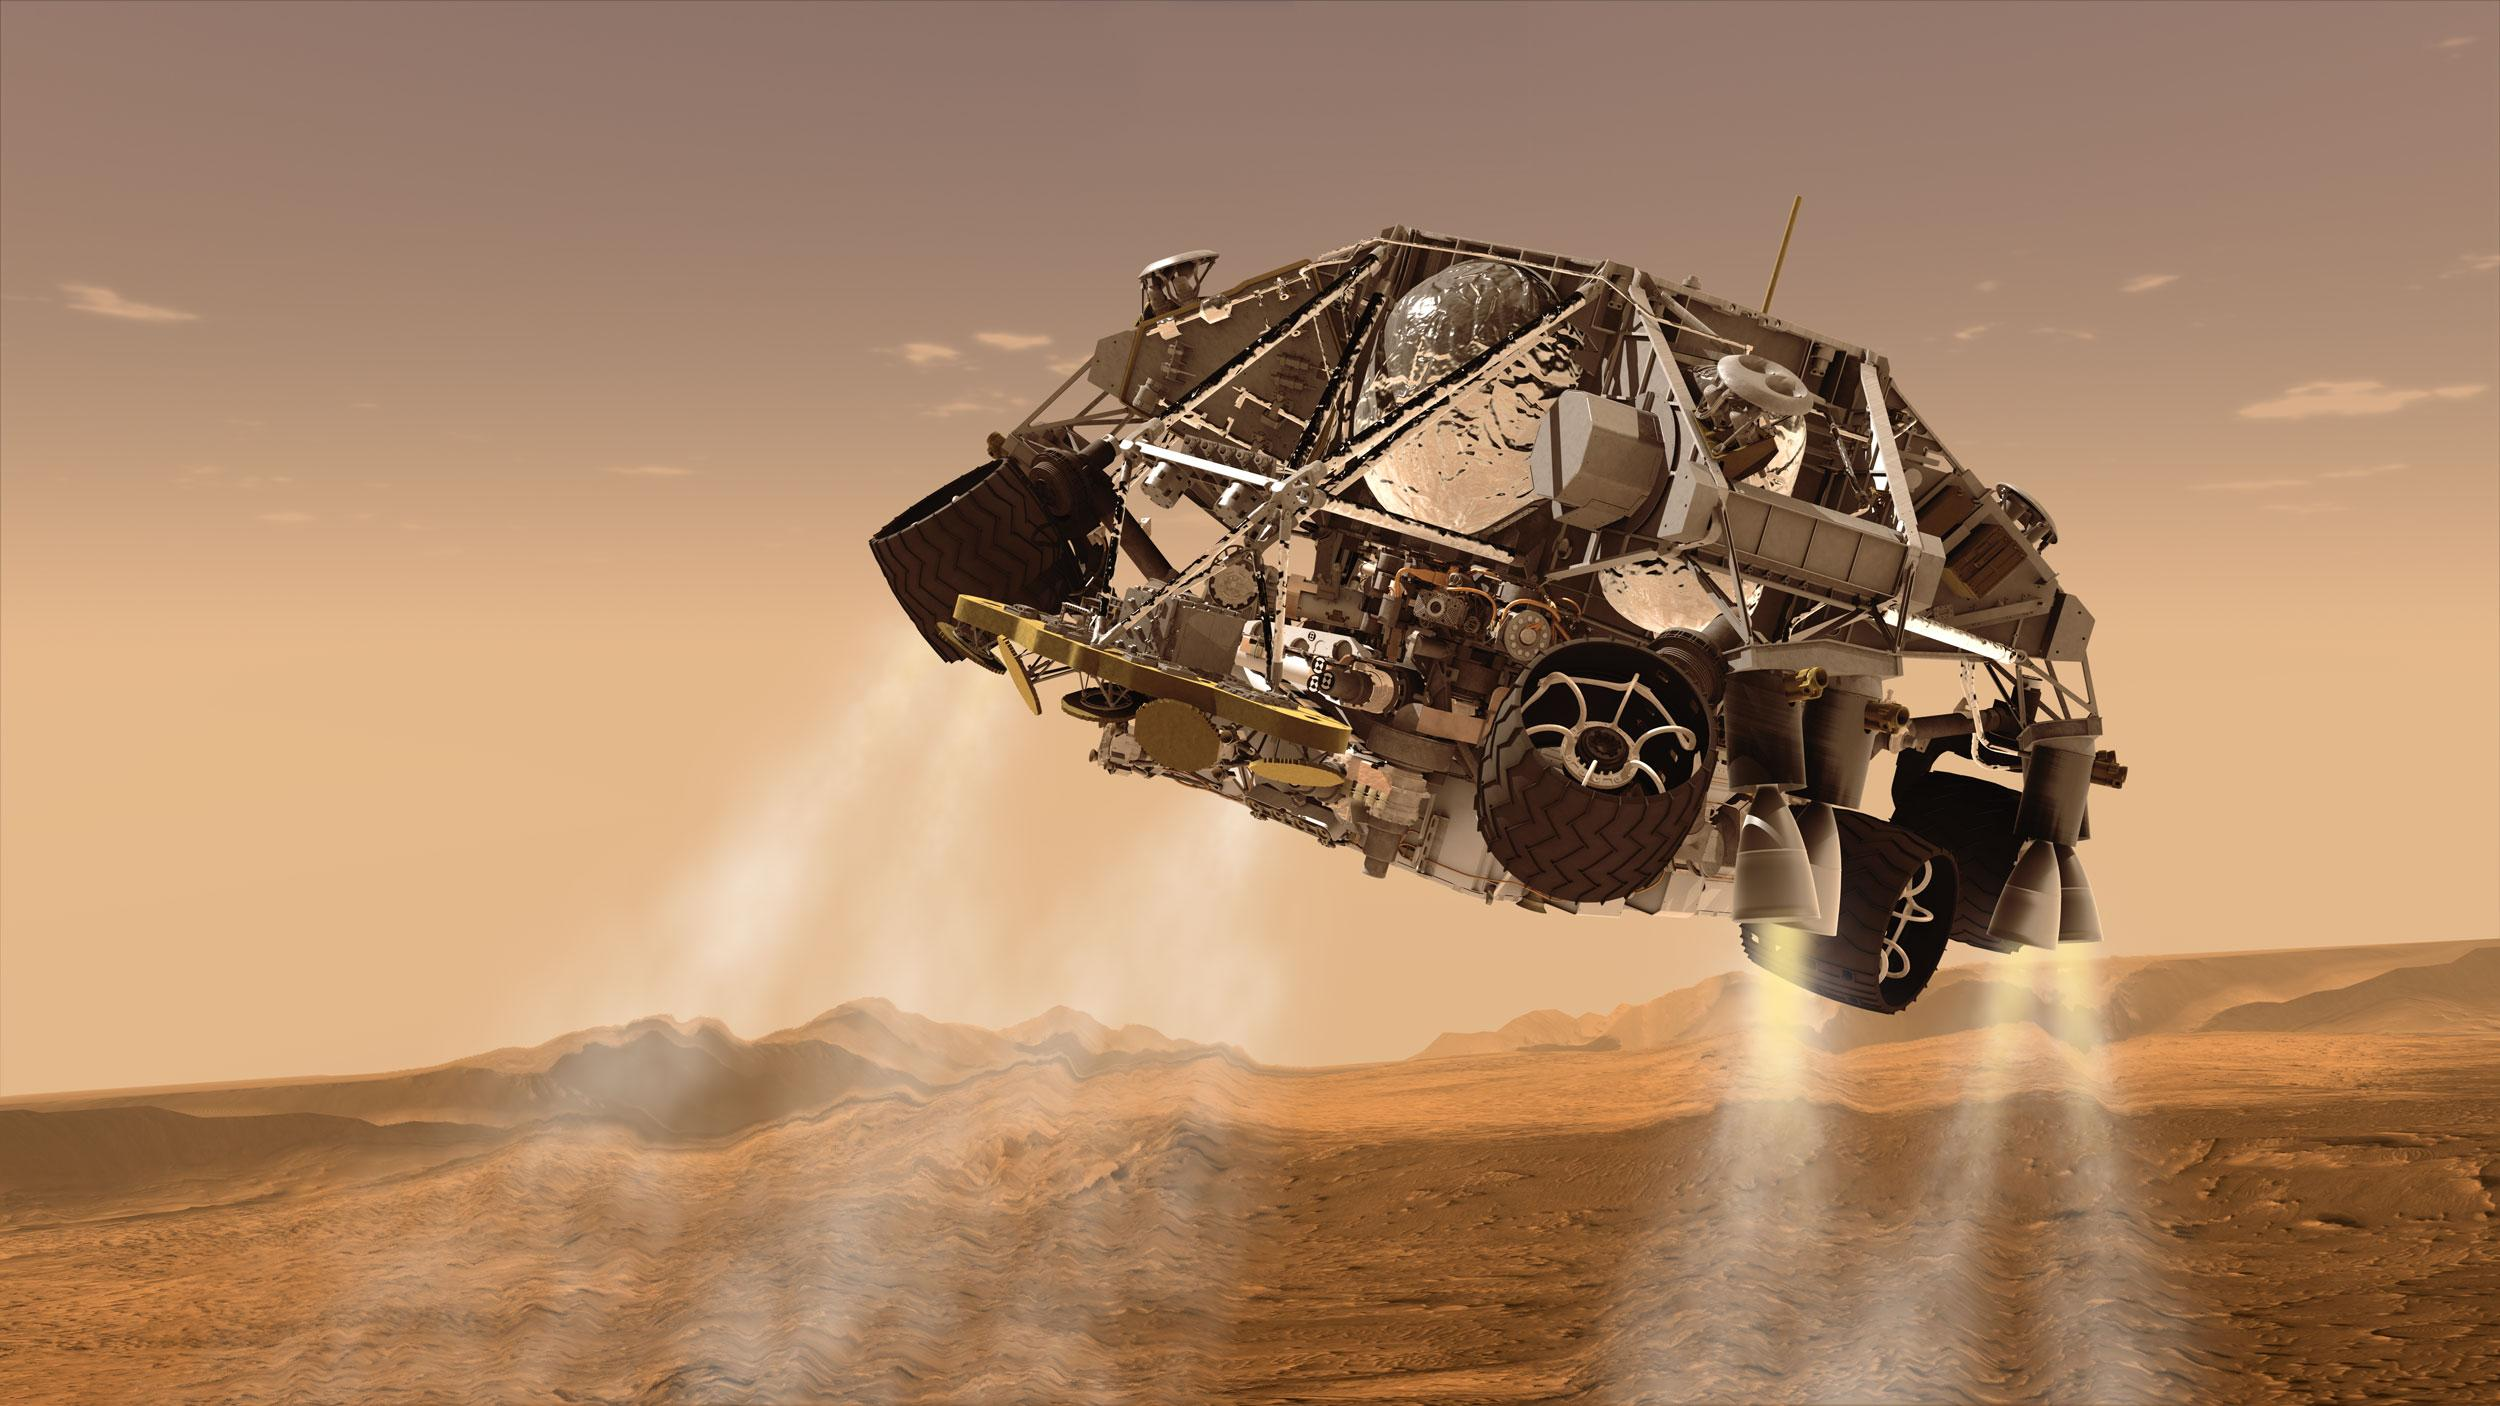 curiosity nasa space machine robot robots landscape landscapes planet    Nasa Wallpaper Curiosity